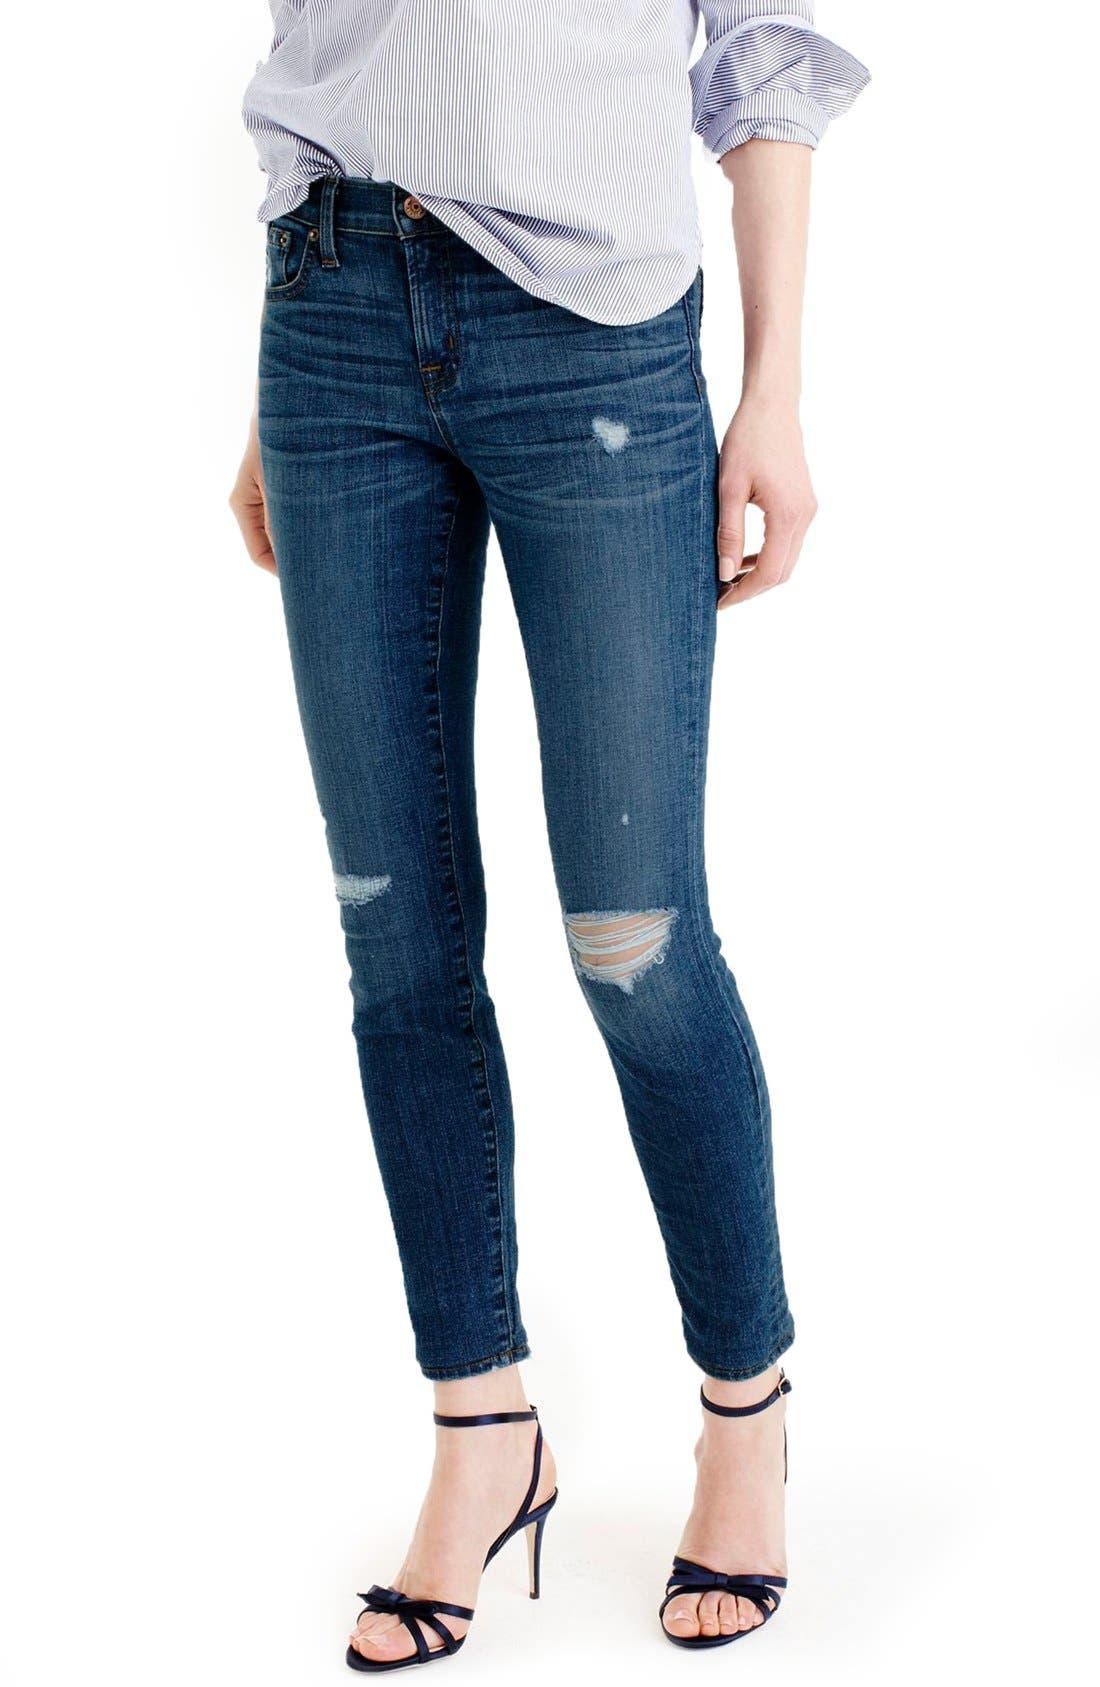 Alternate Image 1 Selected - J.Crew Toothpick Jeans (Pamona) (Regular & Petite)